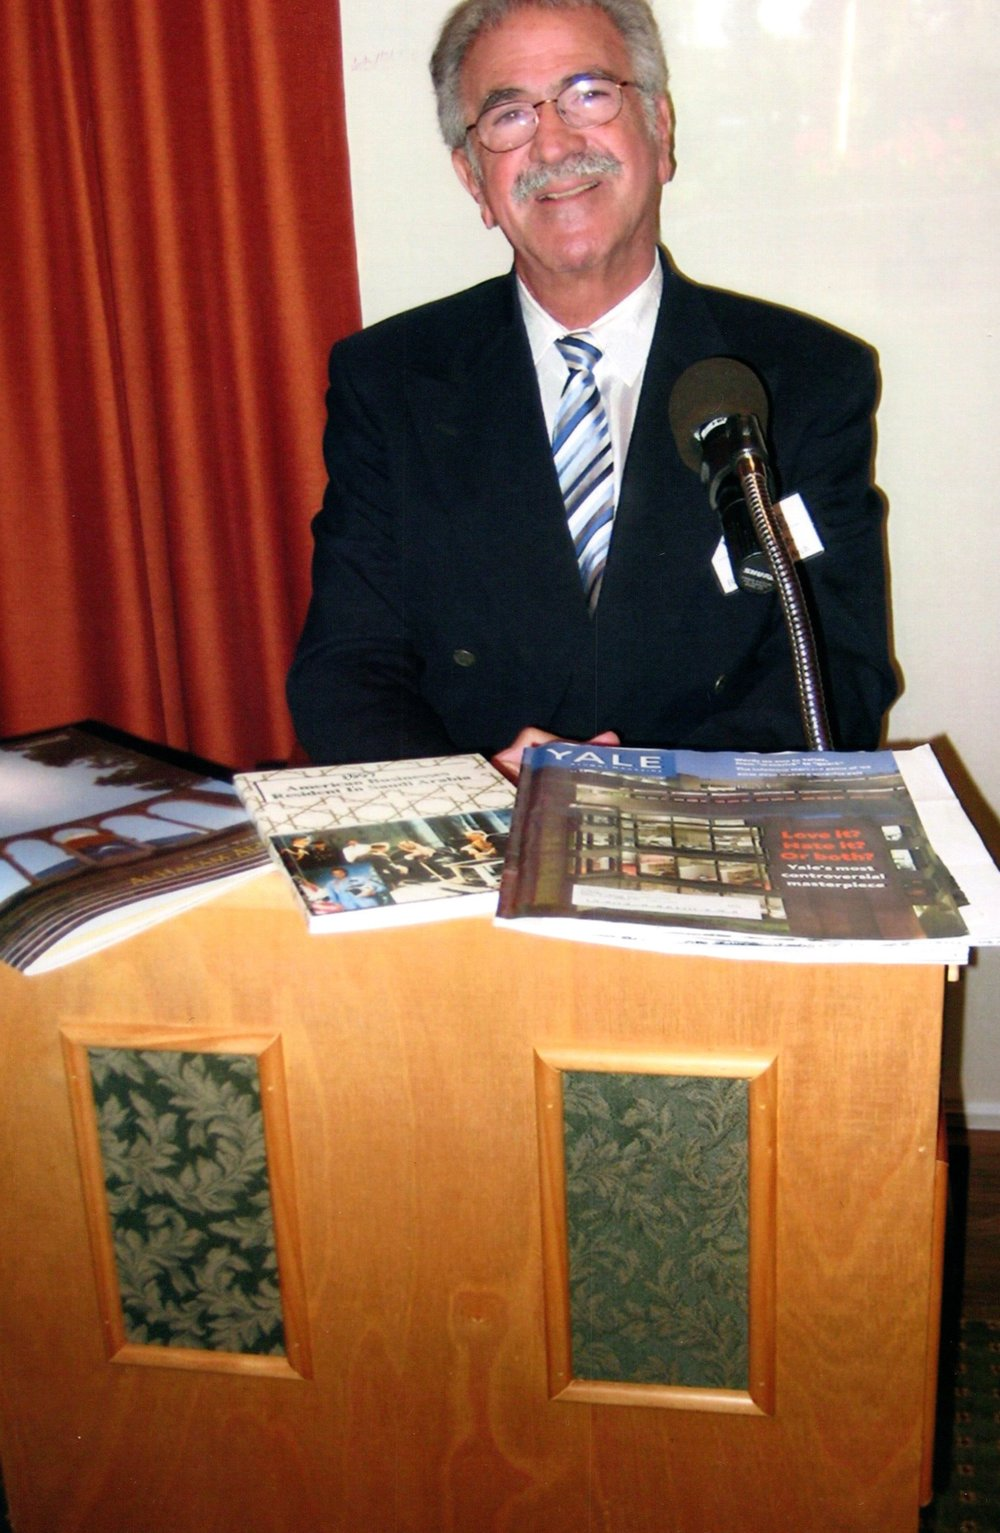 1_8_2009 - SPEAKER LUNCHEON - PELICAN BAY CLUB 3.jpg